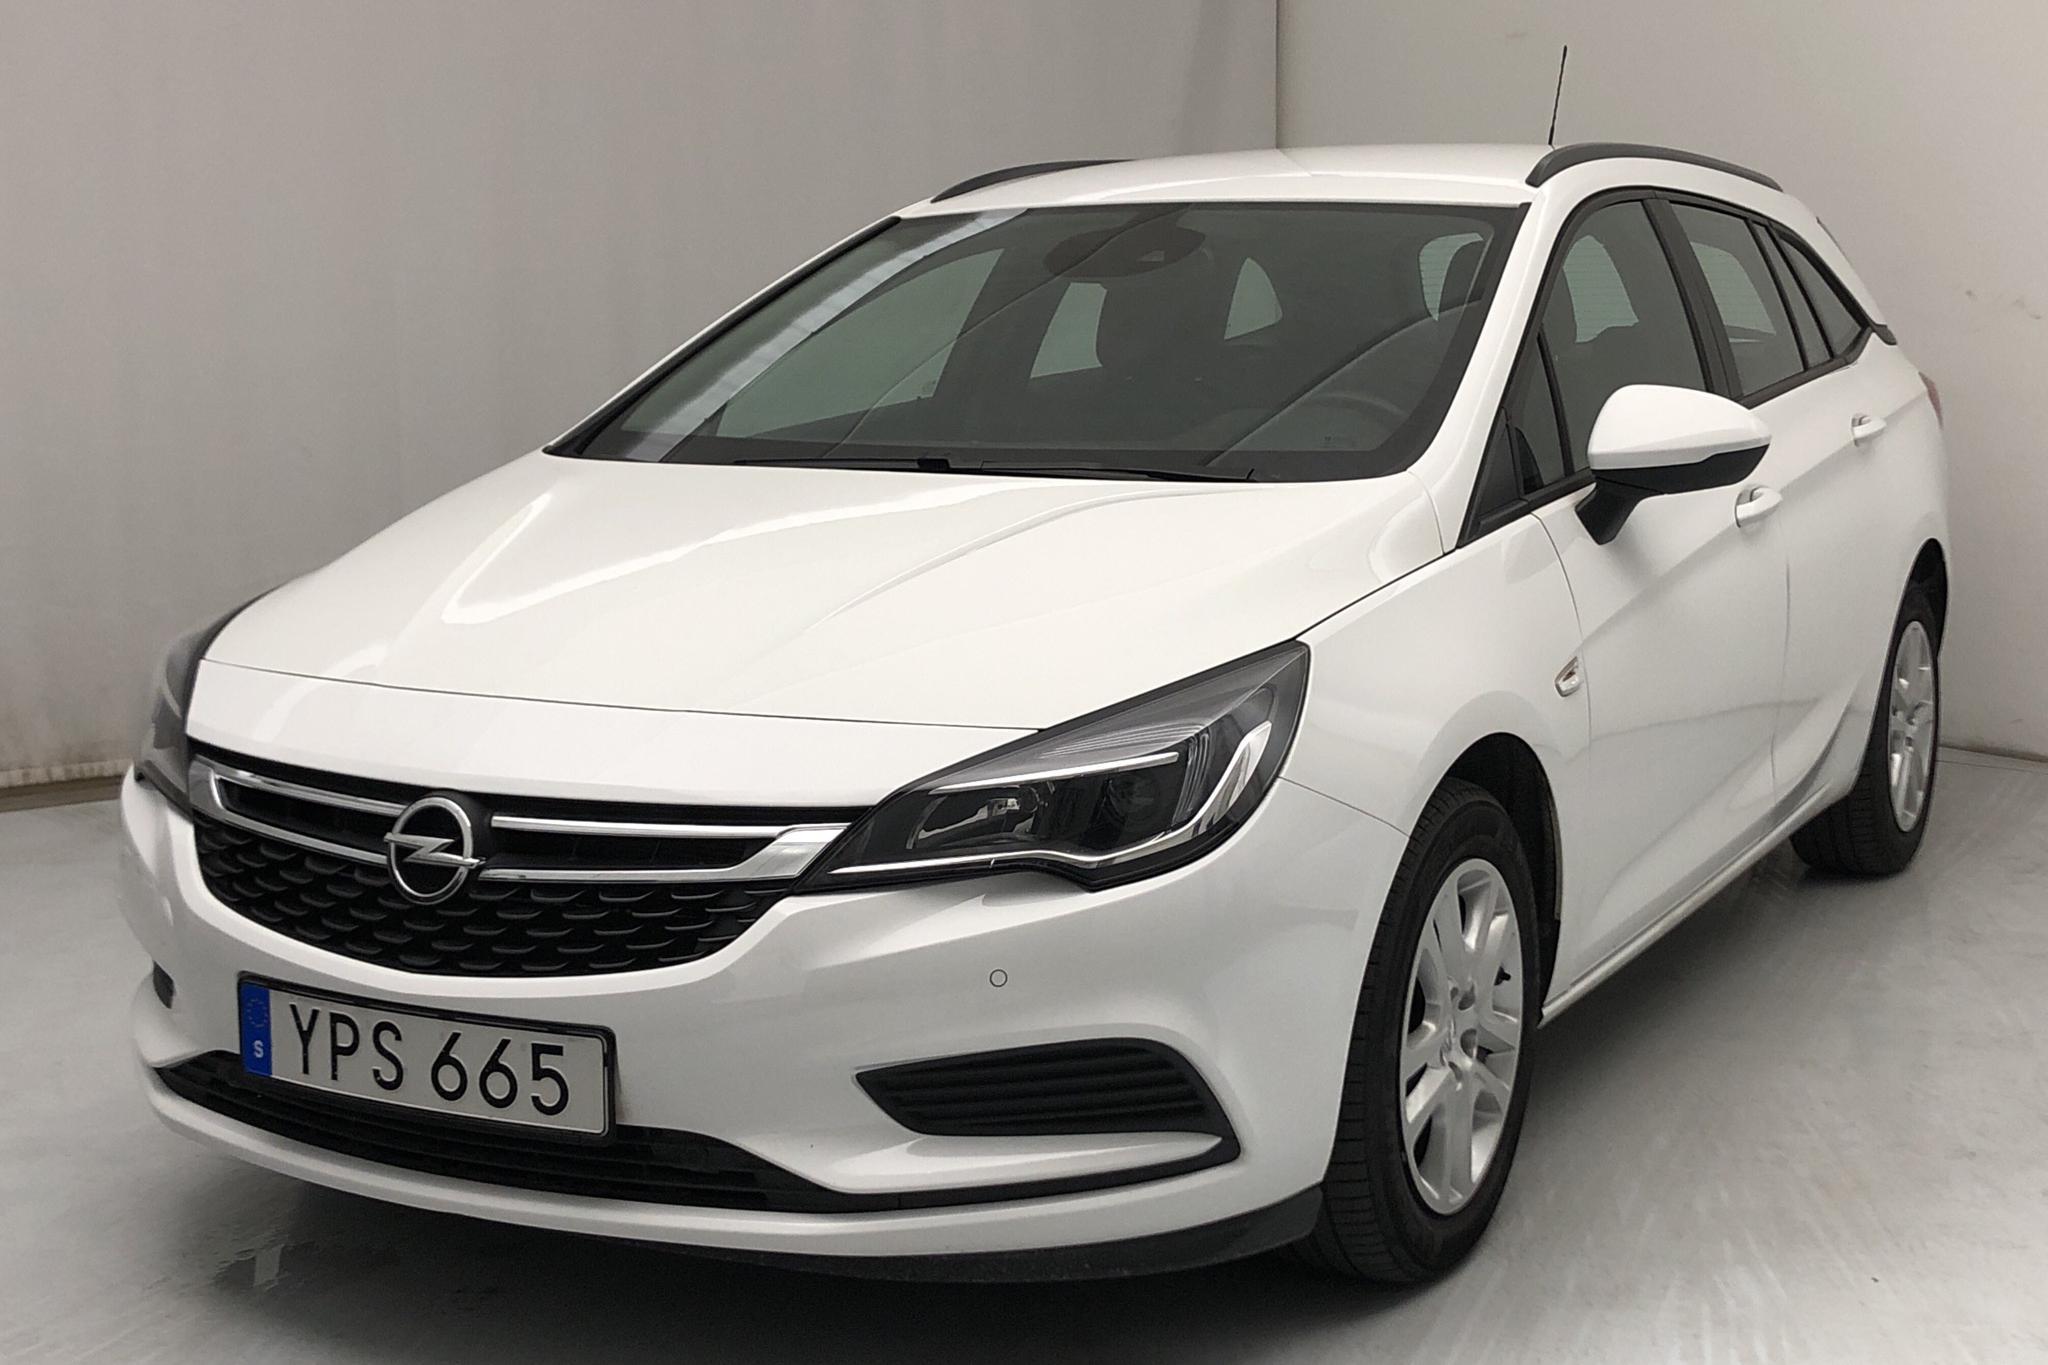 Opel Astra 1.4 Turbo ECOTEC SportsTourer (150hk) - 63 610 km - Automatic - white - 2018